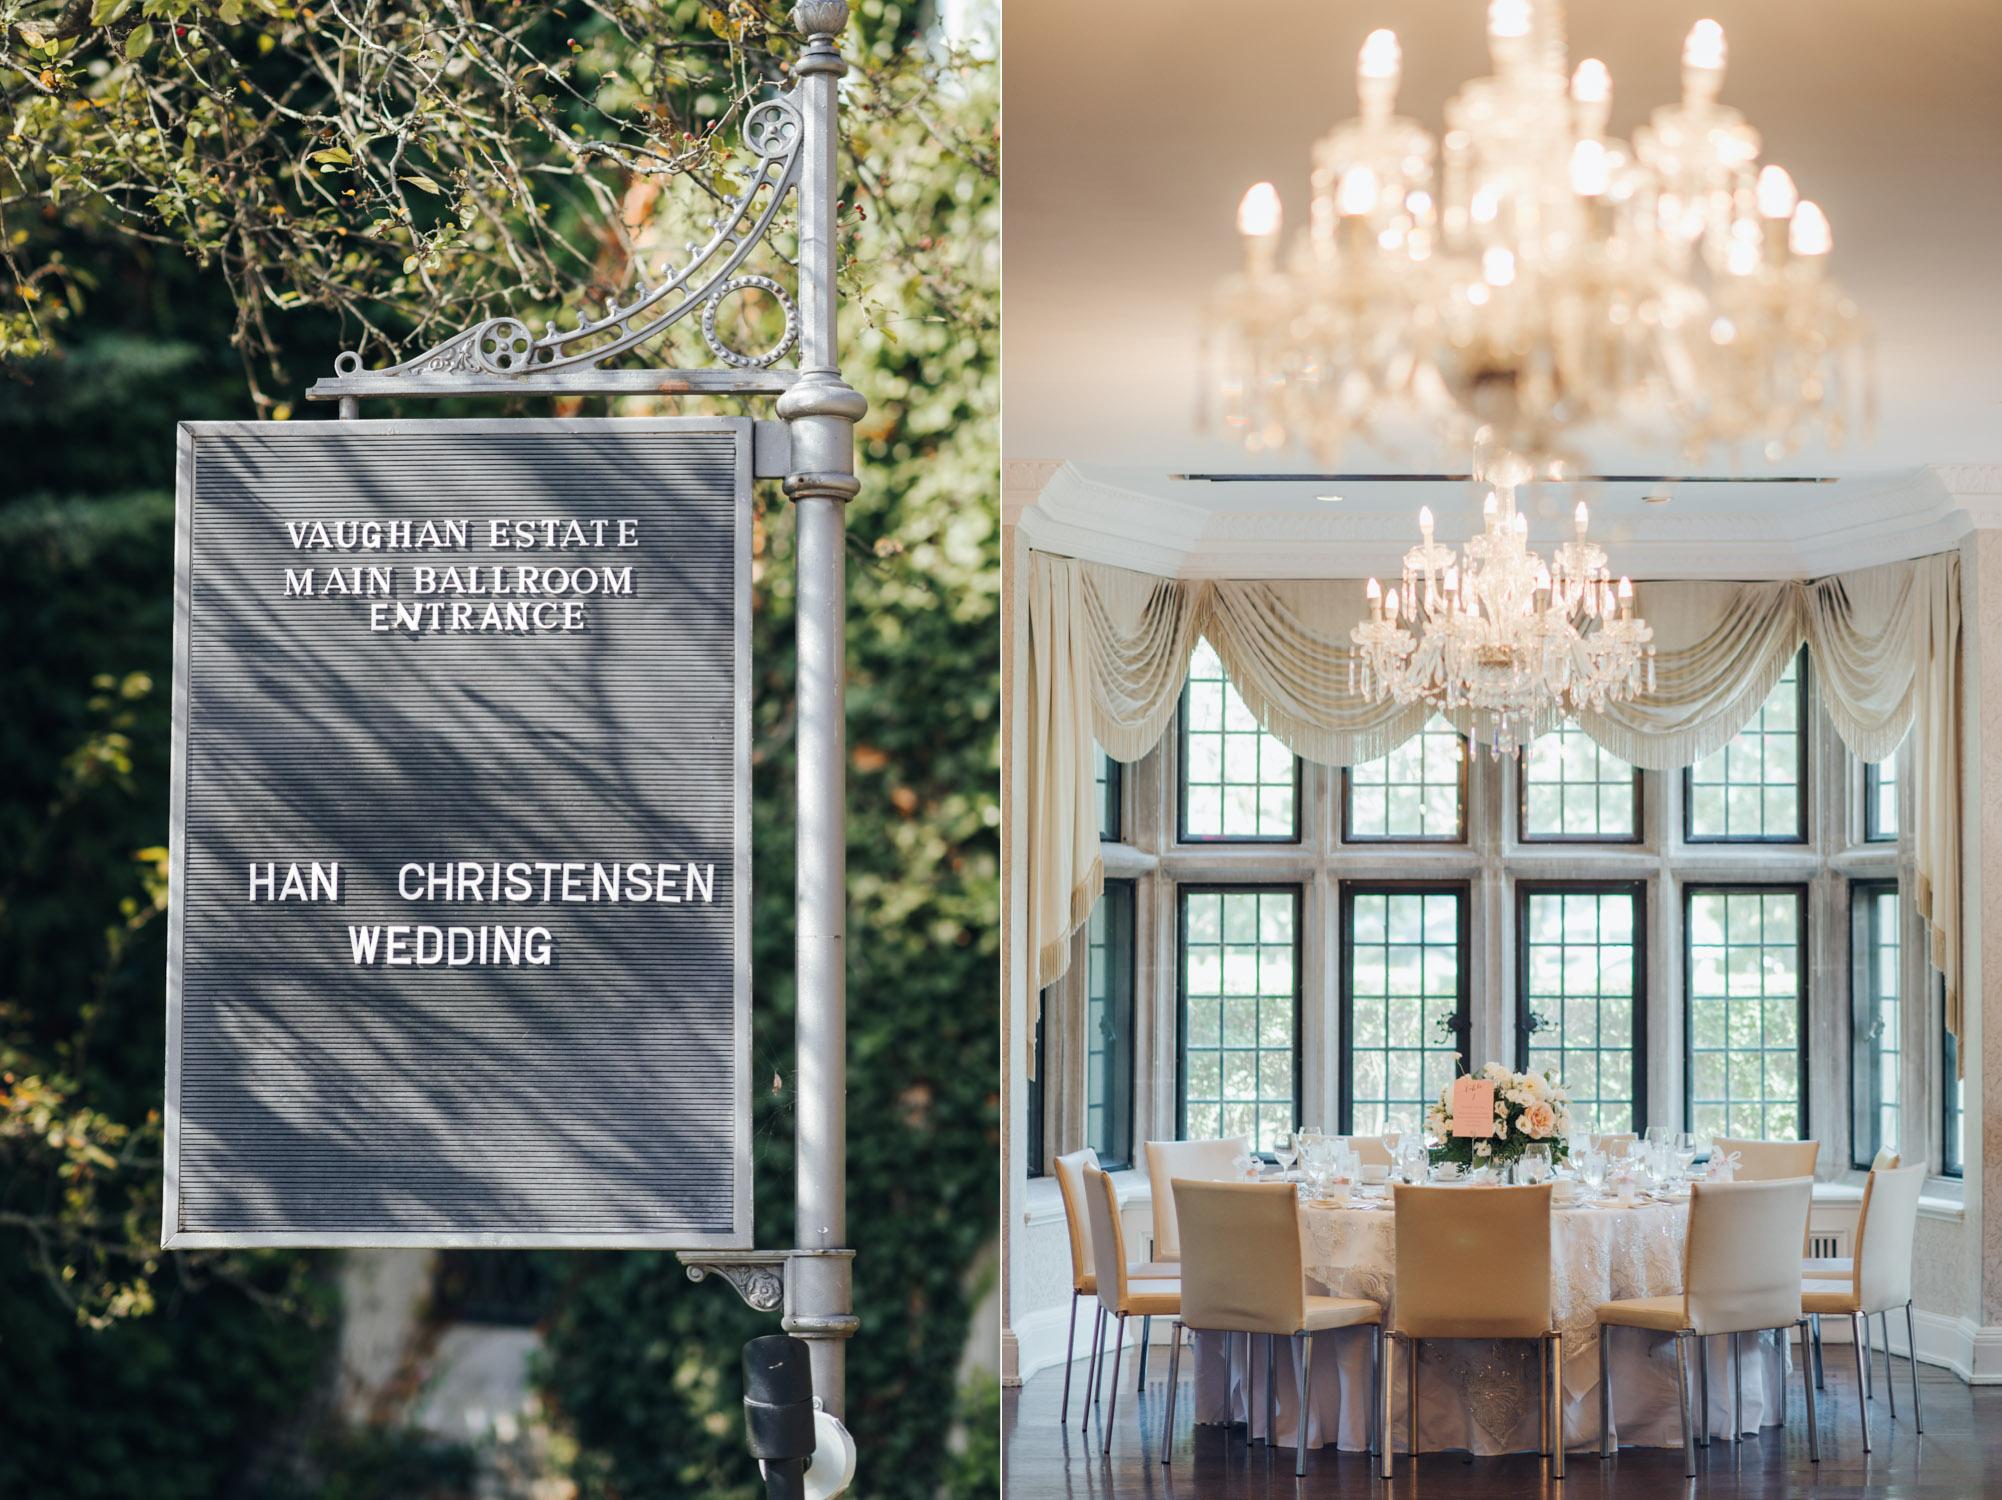 Estates of Sunnybrook Wedding Vaughan Estate Ceremony and Reception Decor ideas